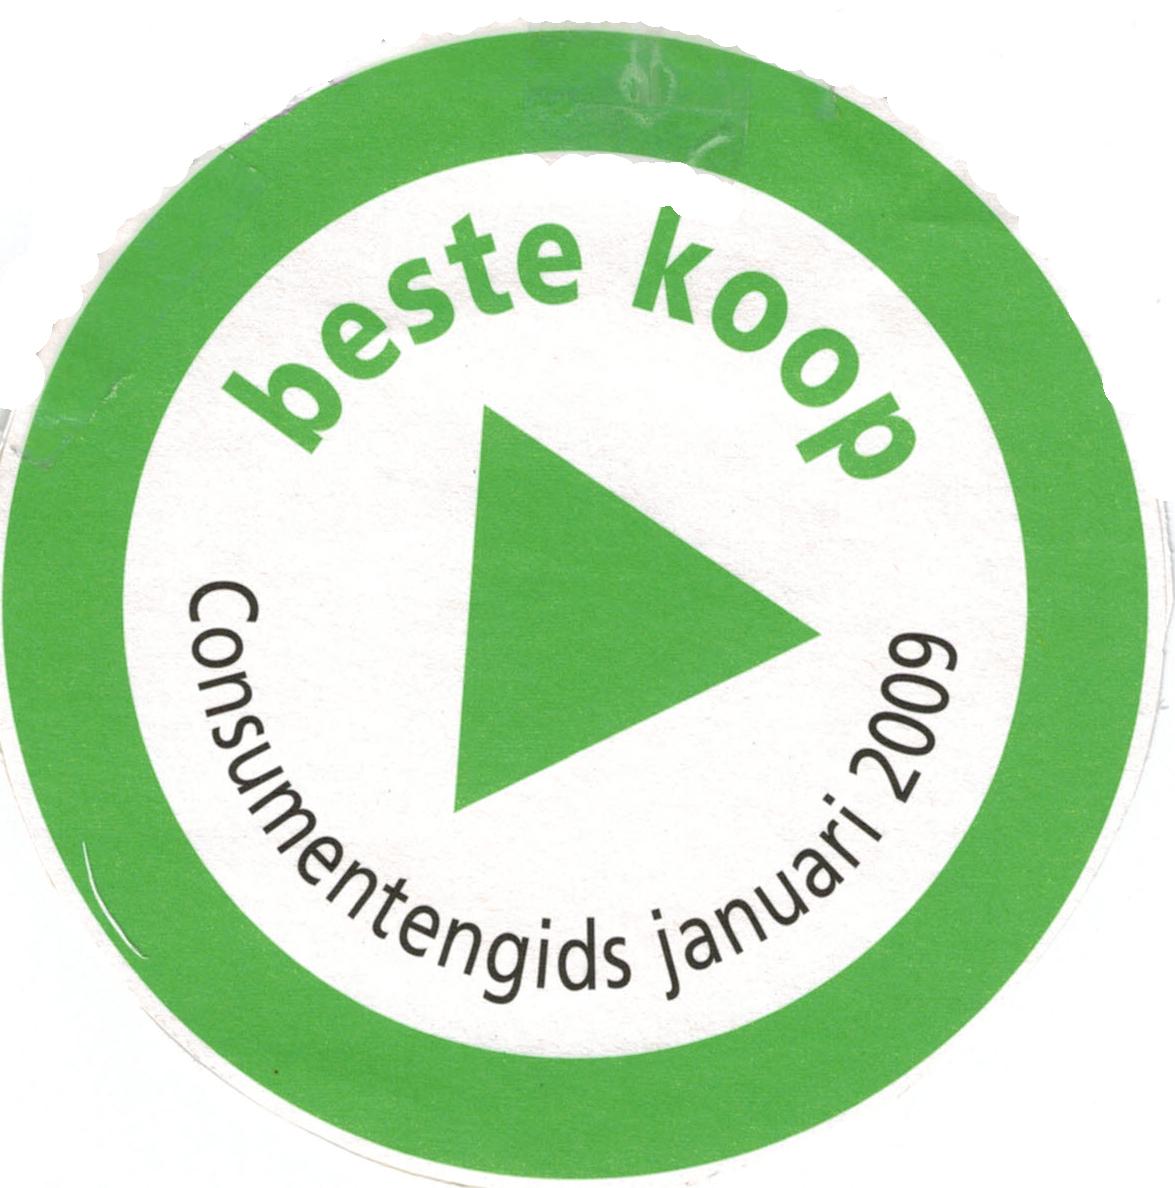 Logo Beste Koop